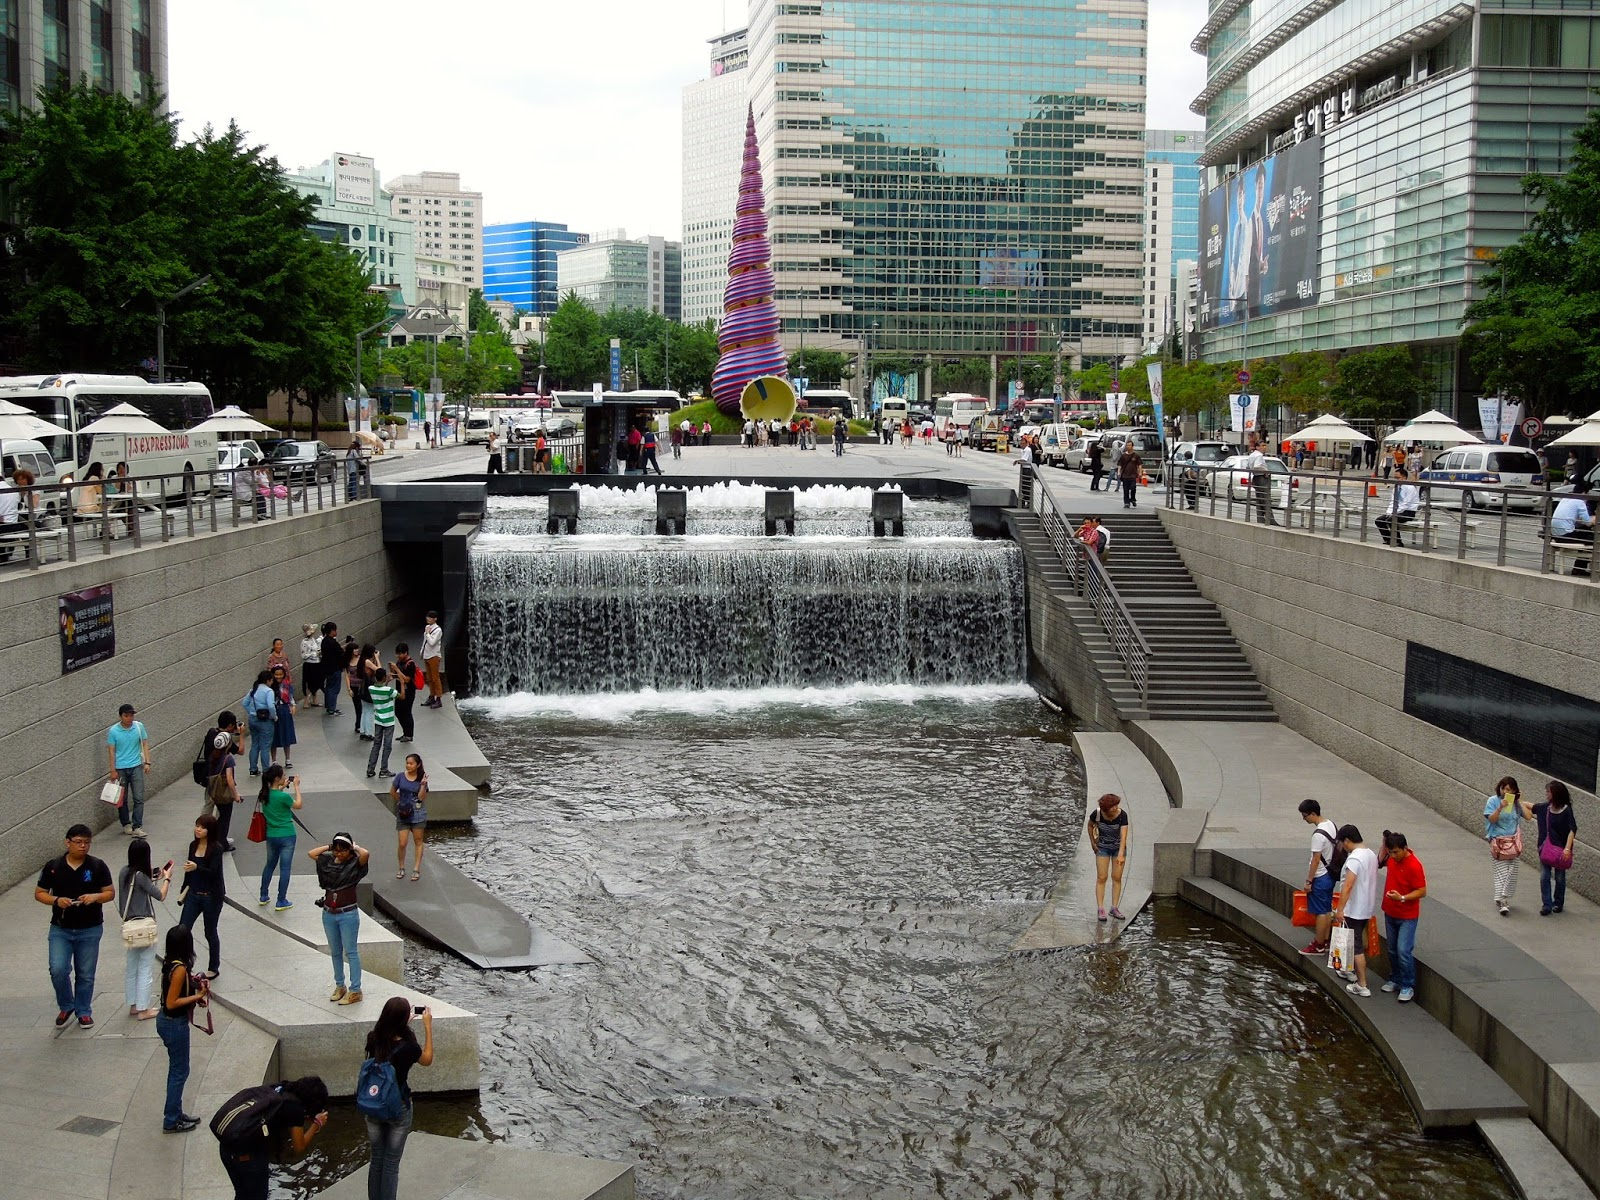 Park of poops in South Korea